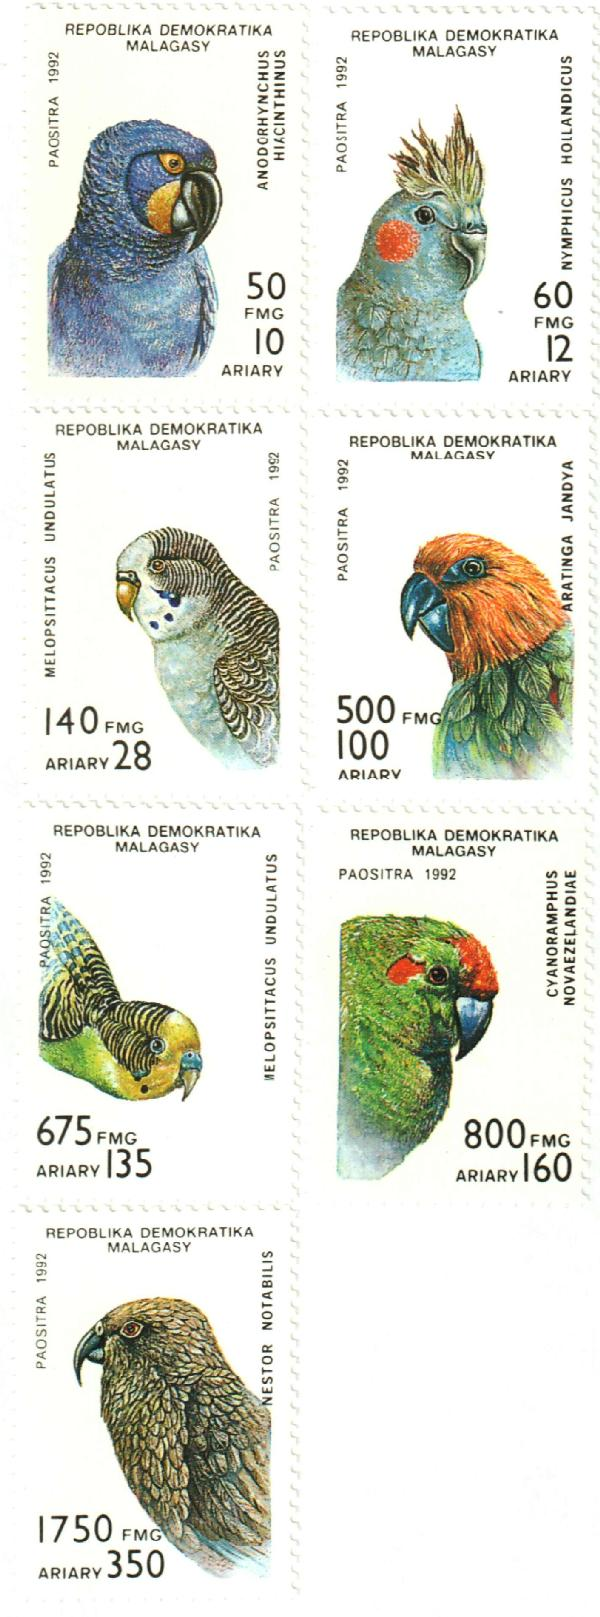 1993 Malagasy Republic